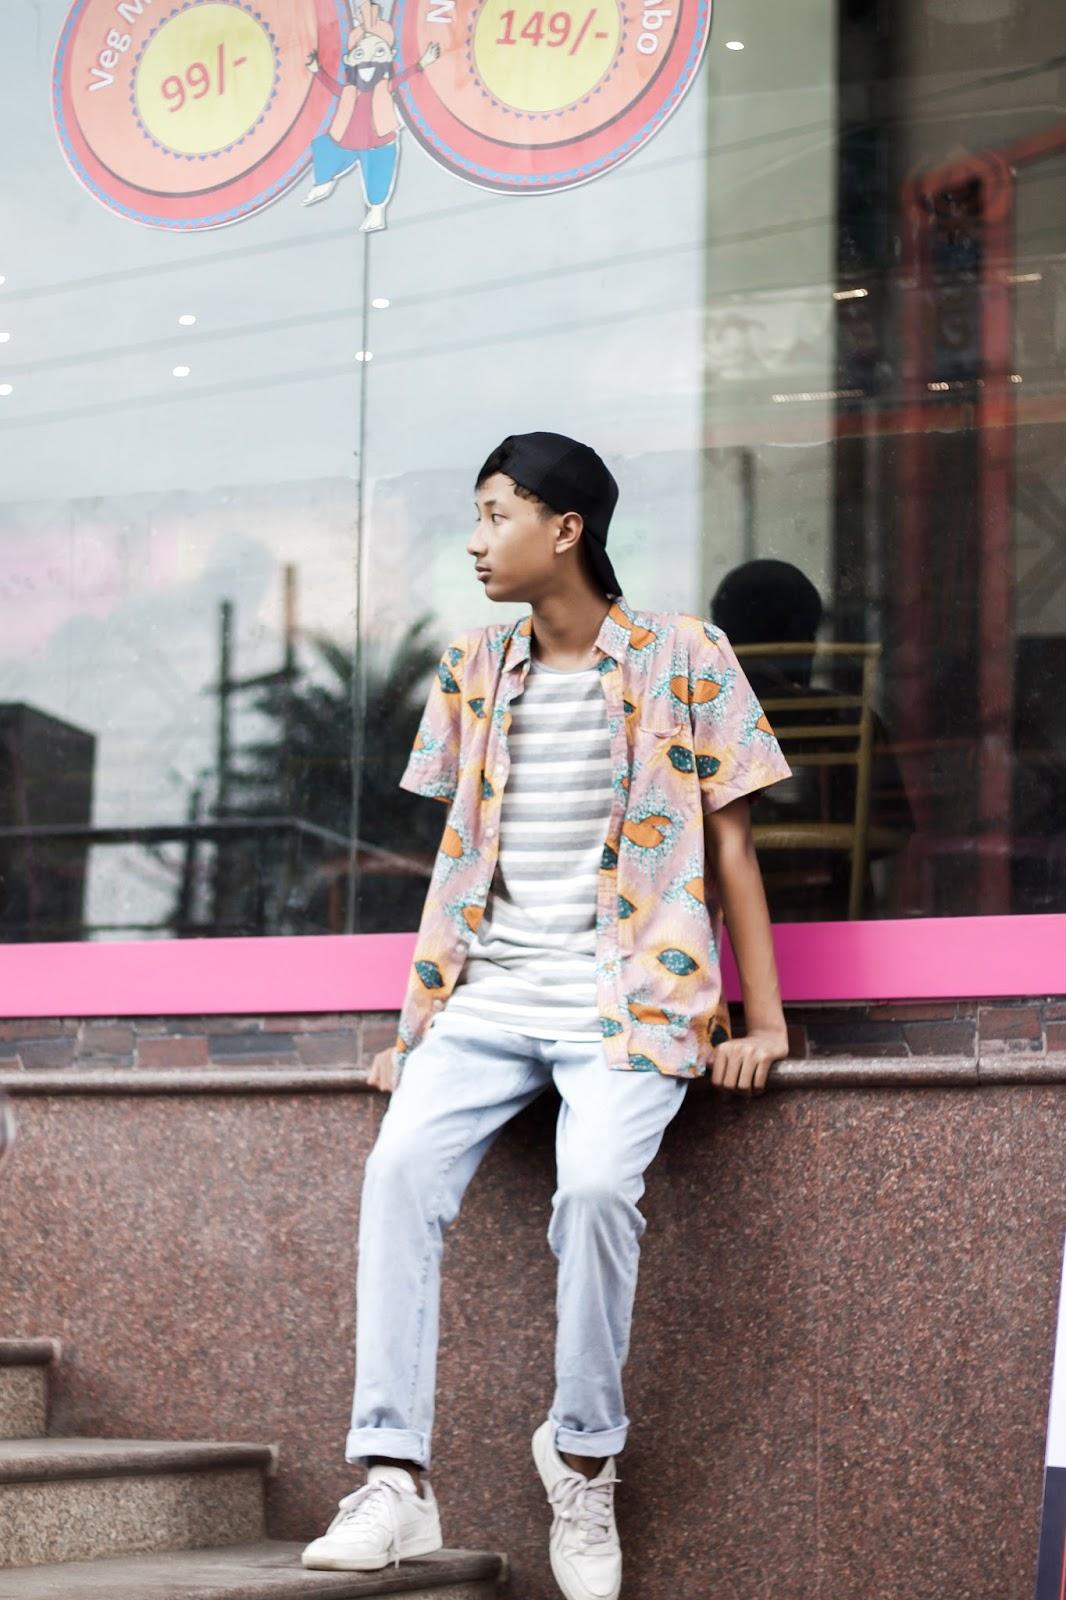 Koovs T-shirt, The Quirky Minimal, CK Jeans, Puma sneakers